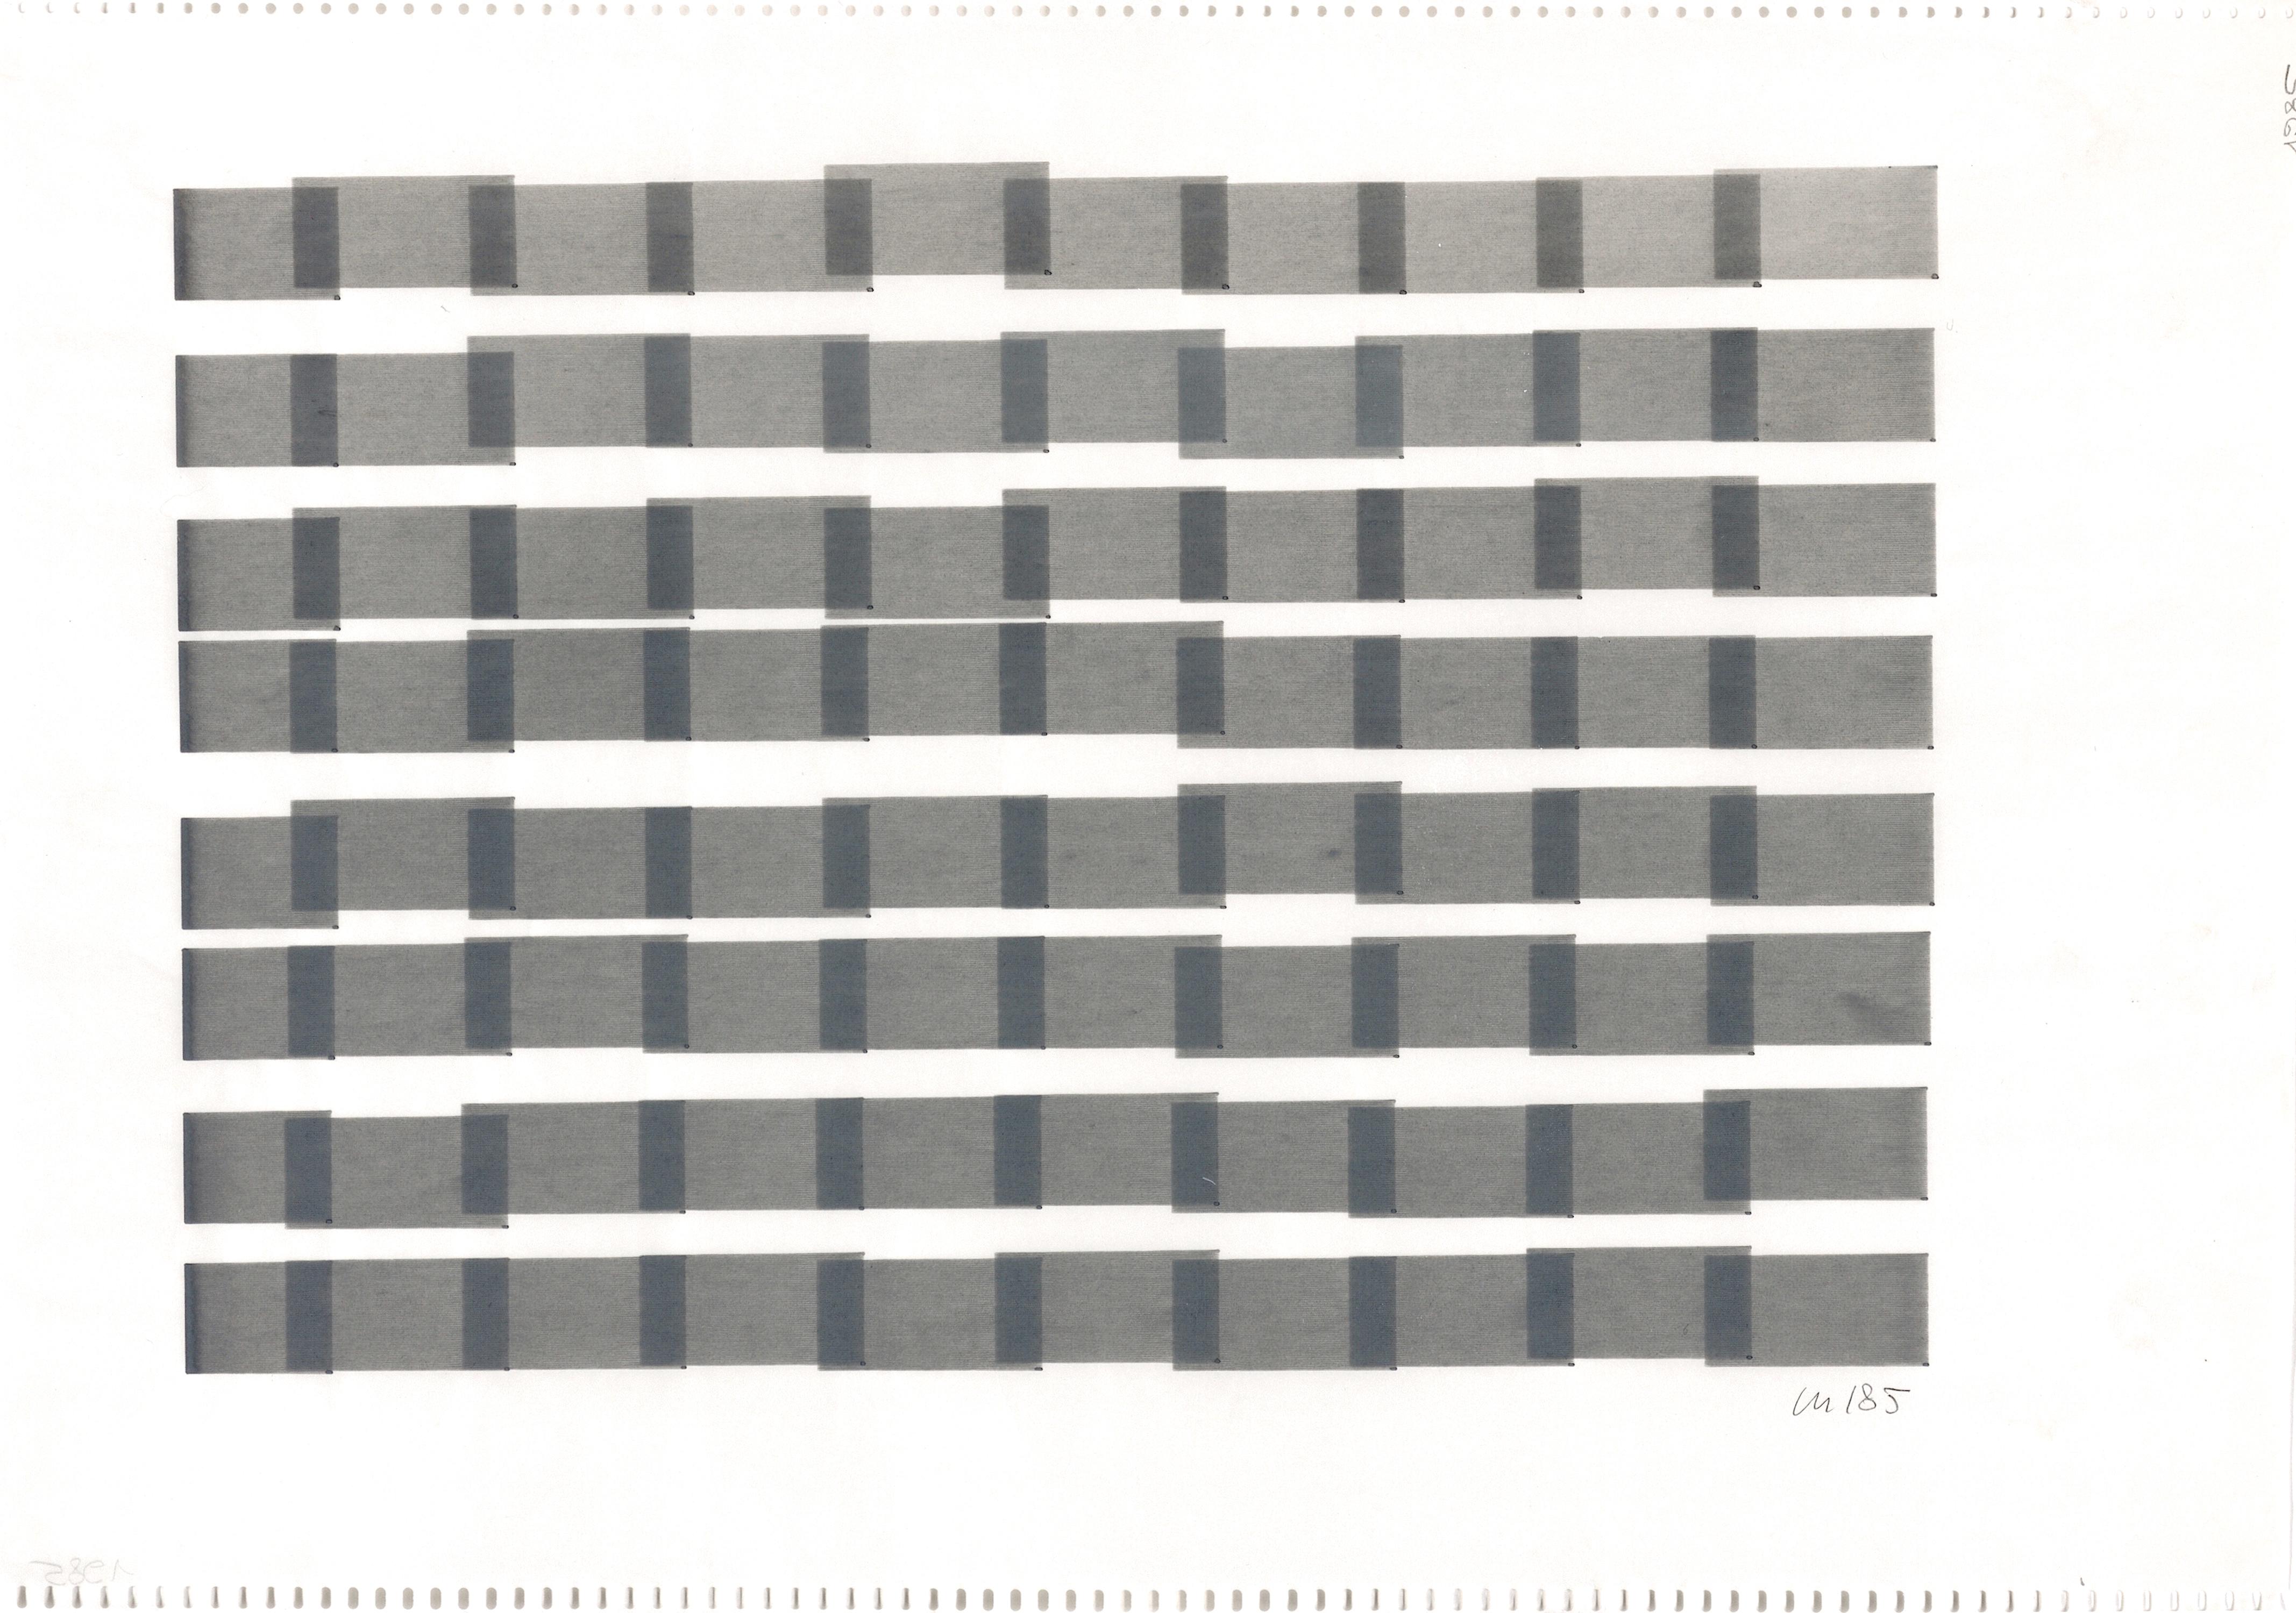 Vera Molnar, 8 Colonnes, 23 x 32 cm, plotter drawing, ink on paper, 1985